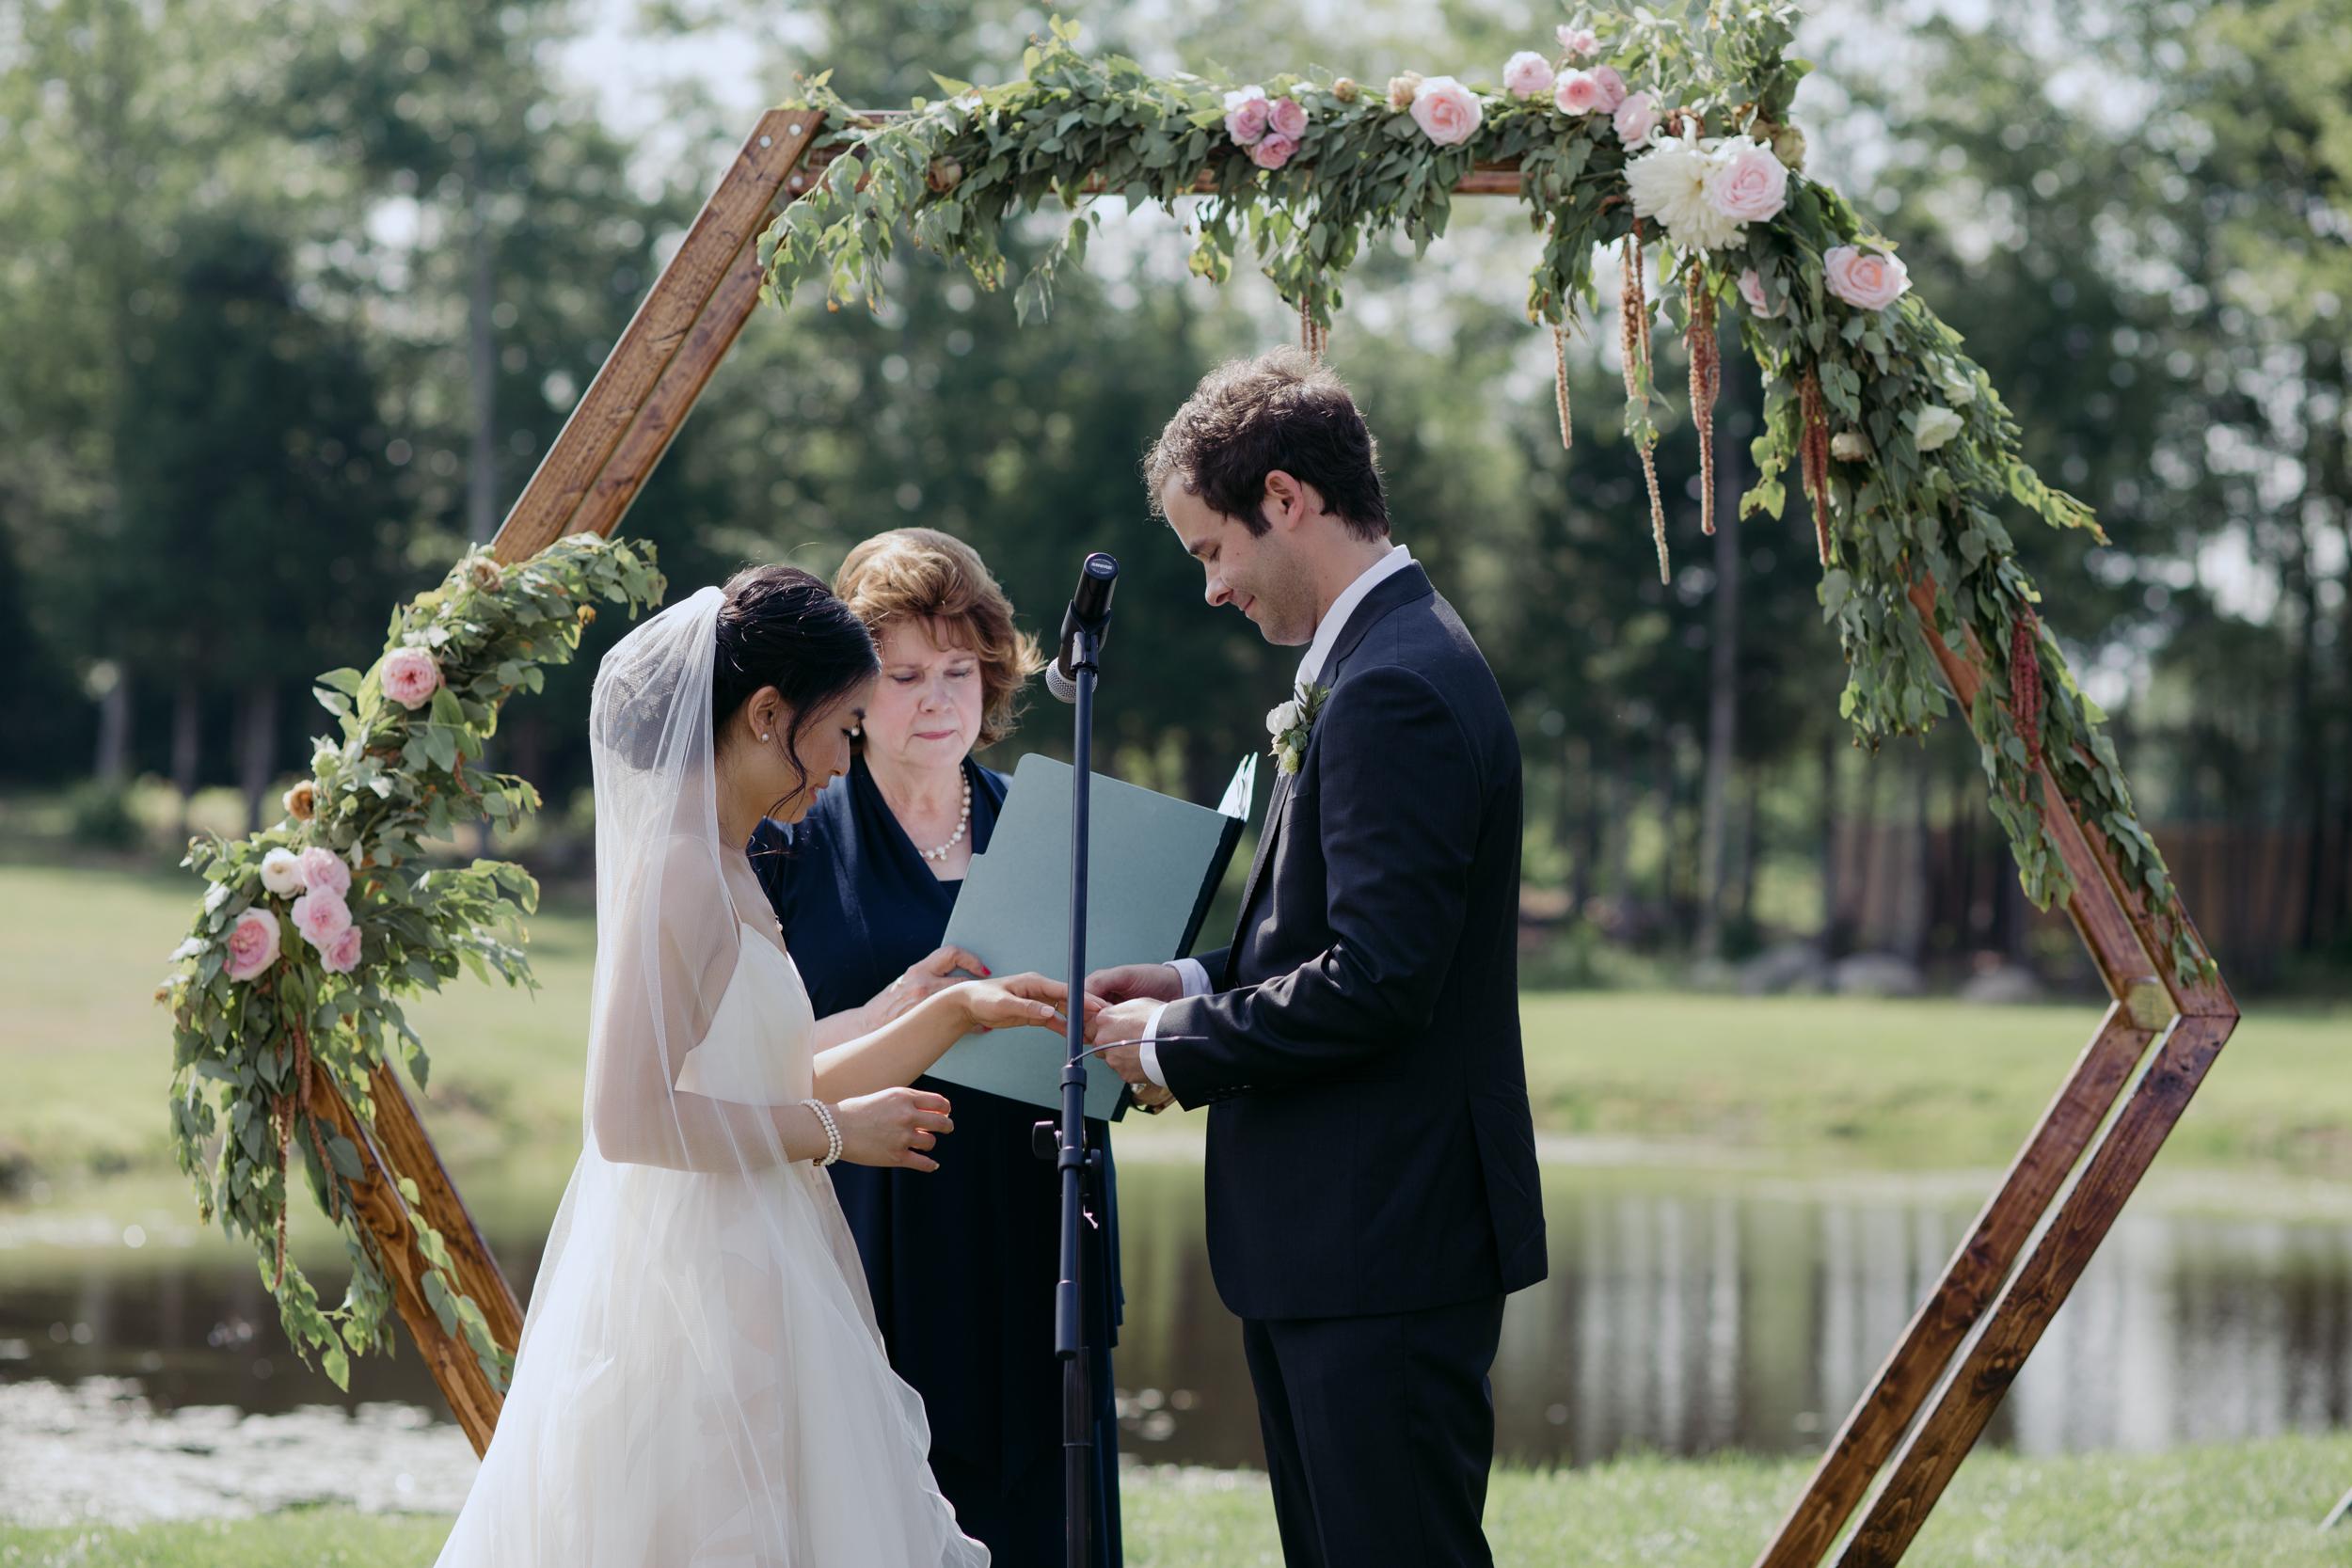 william_allen_farm_wedding_pownal_maine_ilkatayler-17.jpg